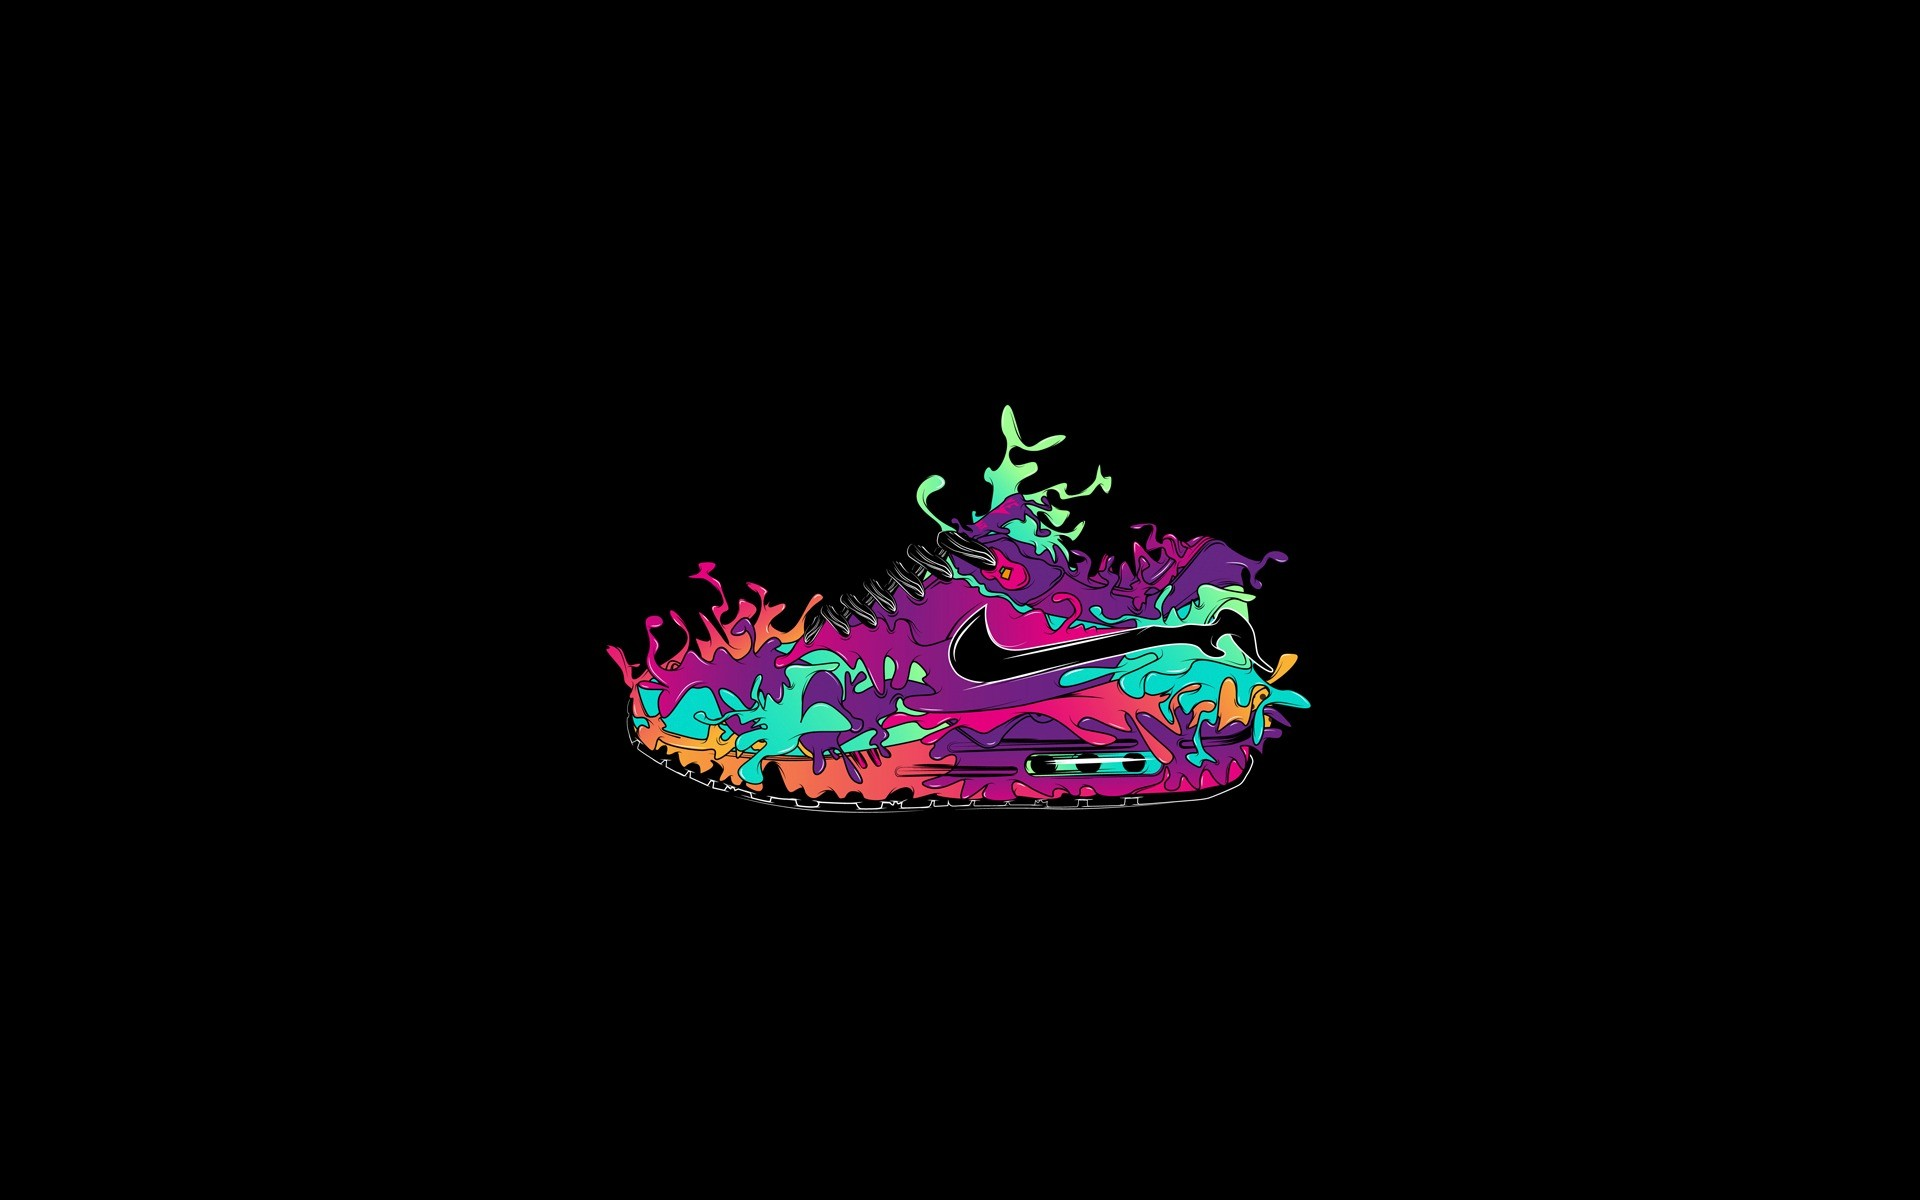 Cool Nike Wallpaper HD